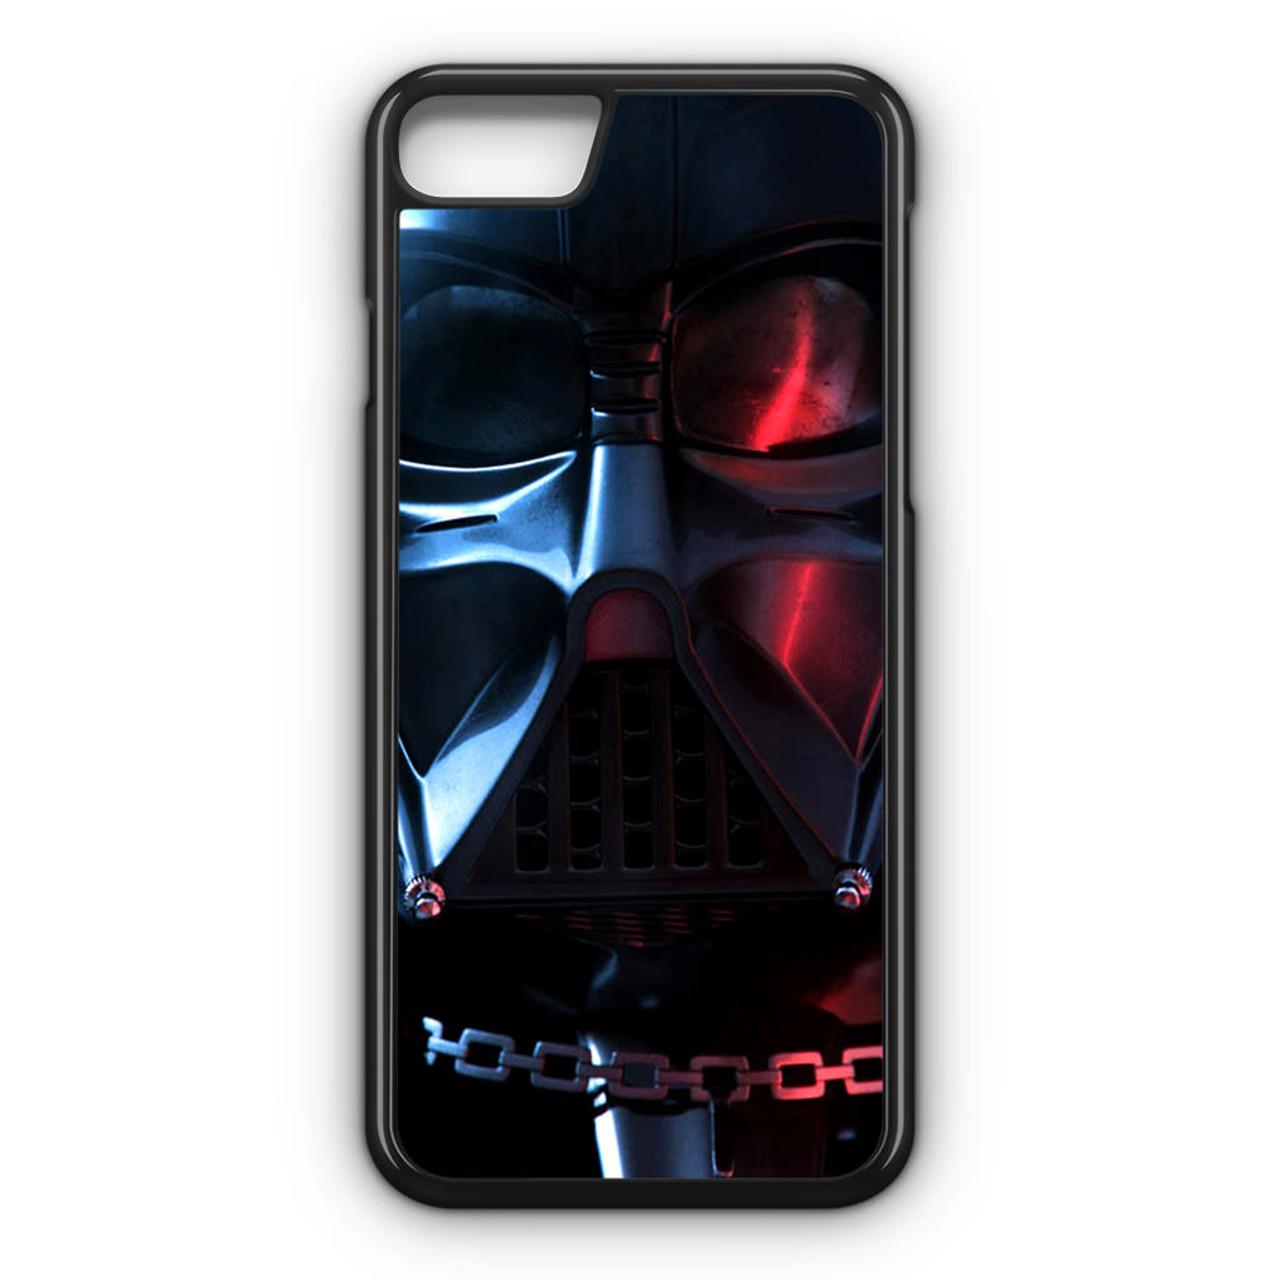 super popular d71e1 c2045 Movie Star Wars Darth Vader iPhone 7 Case